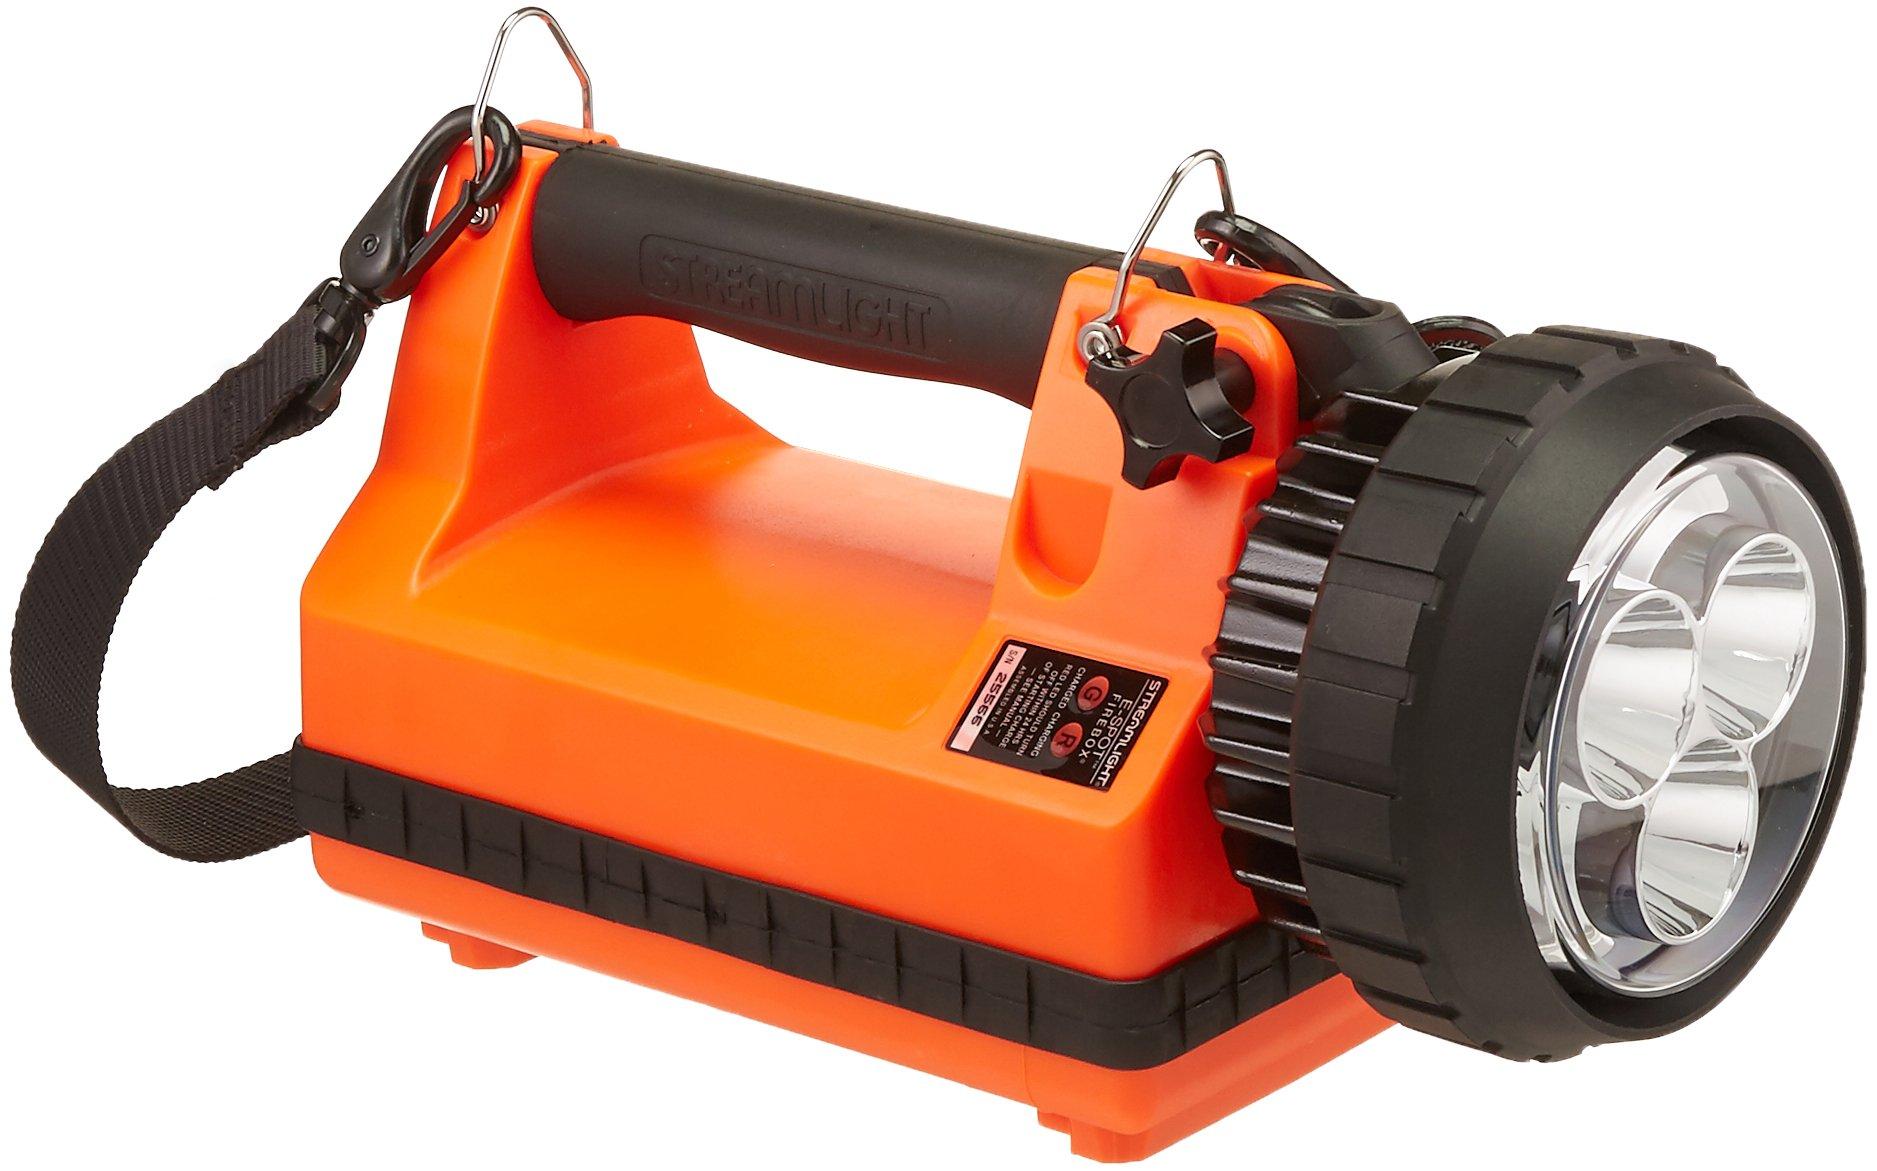 Streamlight 45861 E-Spot Firebox Lantern Standard System with 120V AC/12V DC Charge Cords, Shoulder Strap and Mounting Rack, Orange